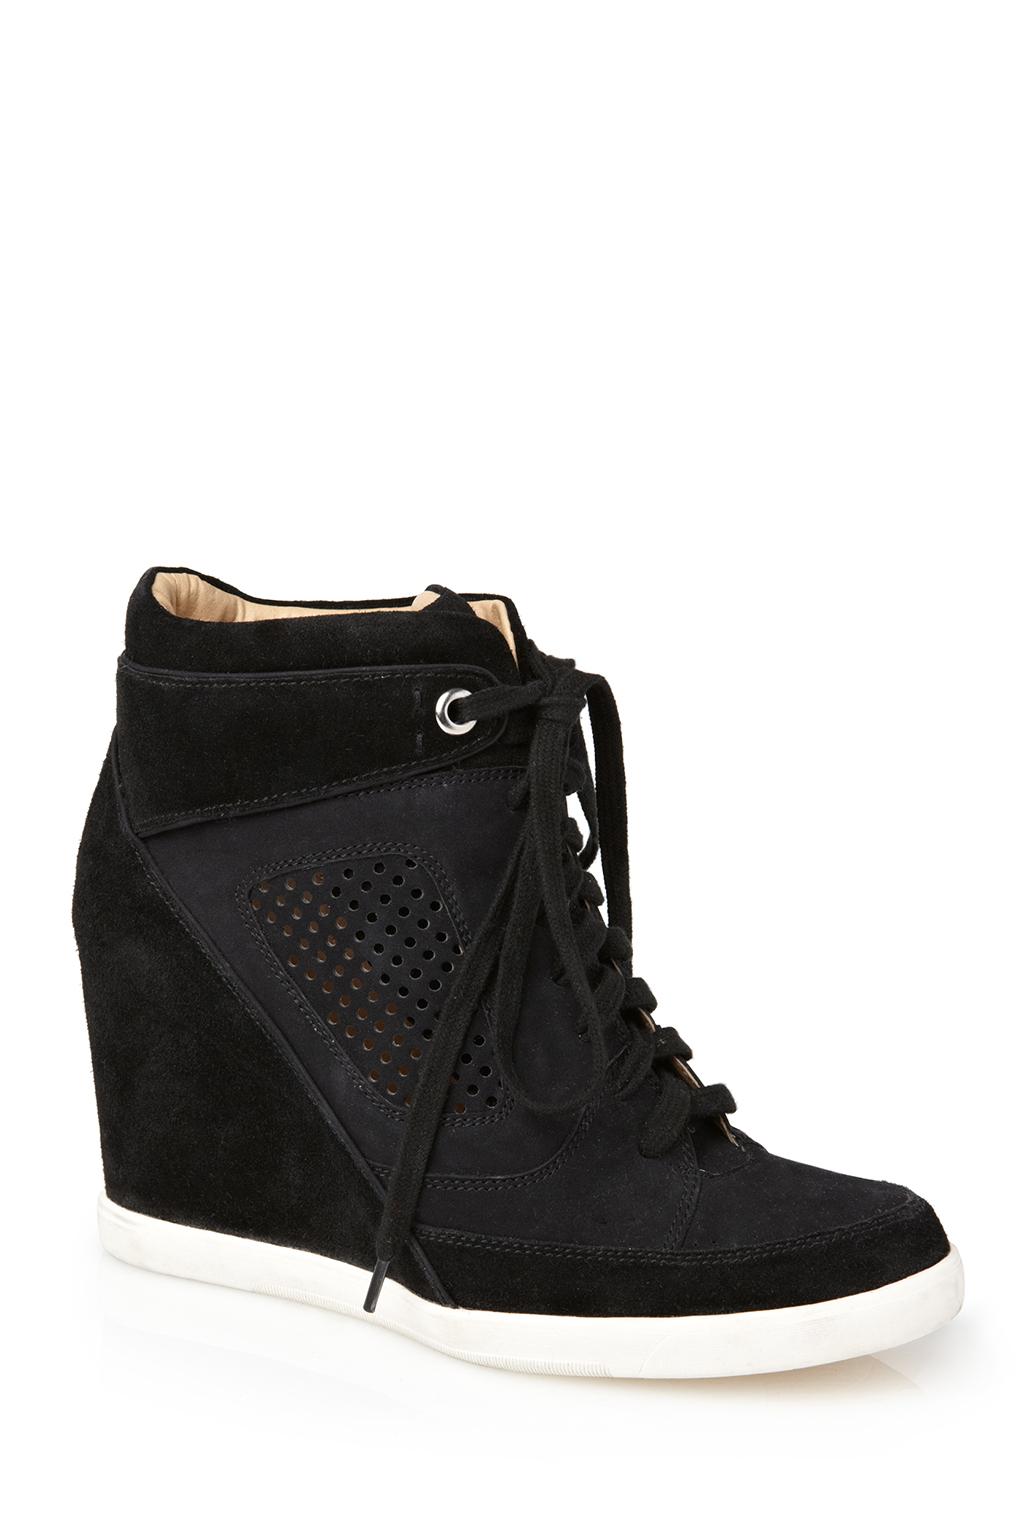 Black Wedge Tennis Shoes